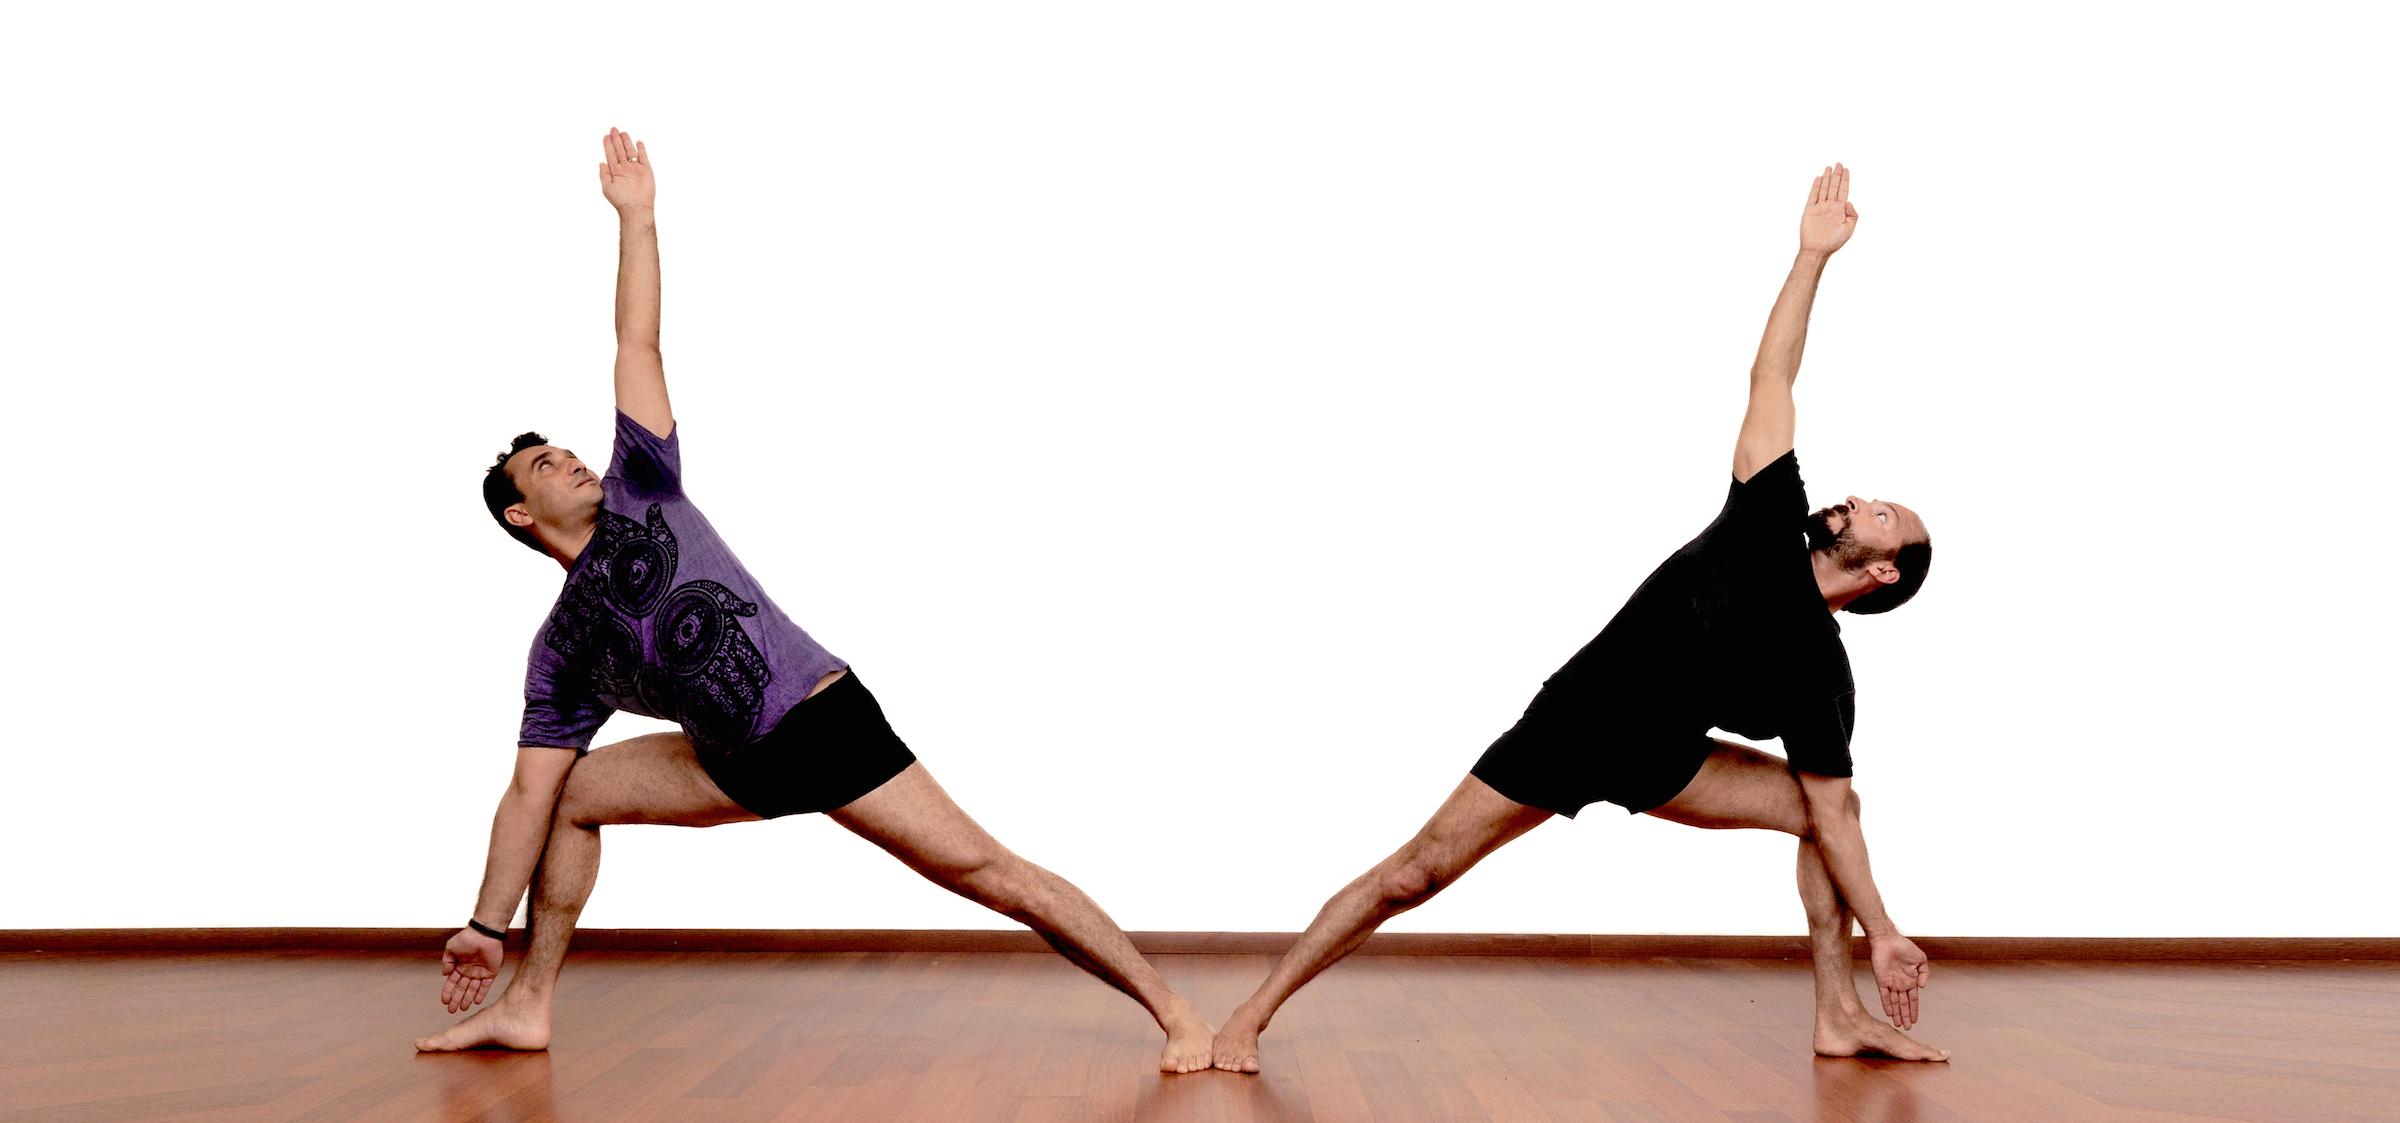 Bikram Yoga® – Hot Yoga Classes, Workshops & Training